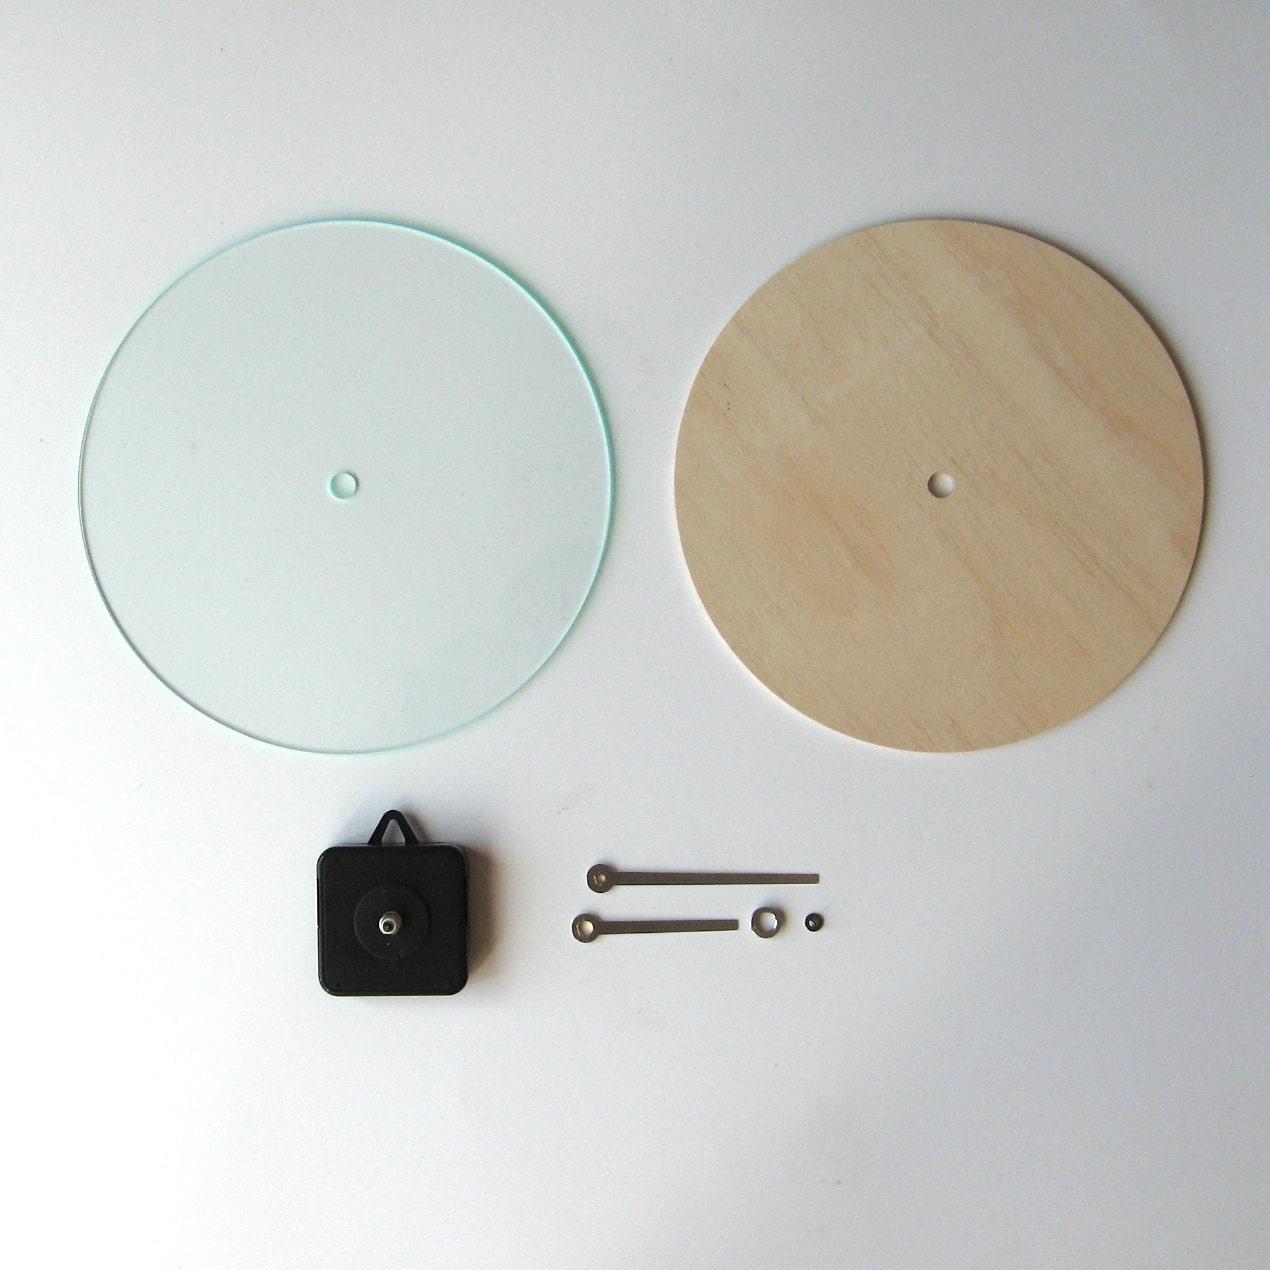 Objectify diy wall clock kit round for Diy clock